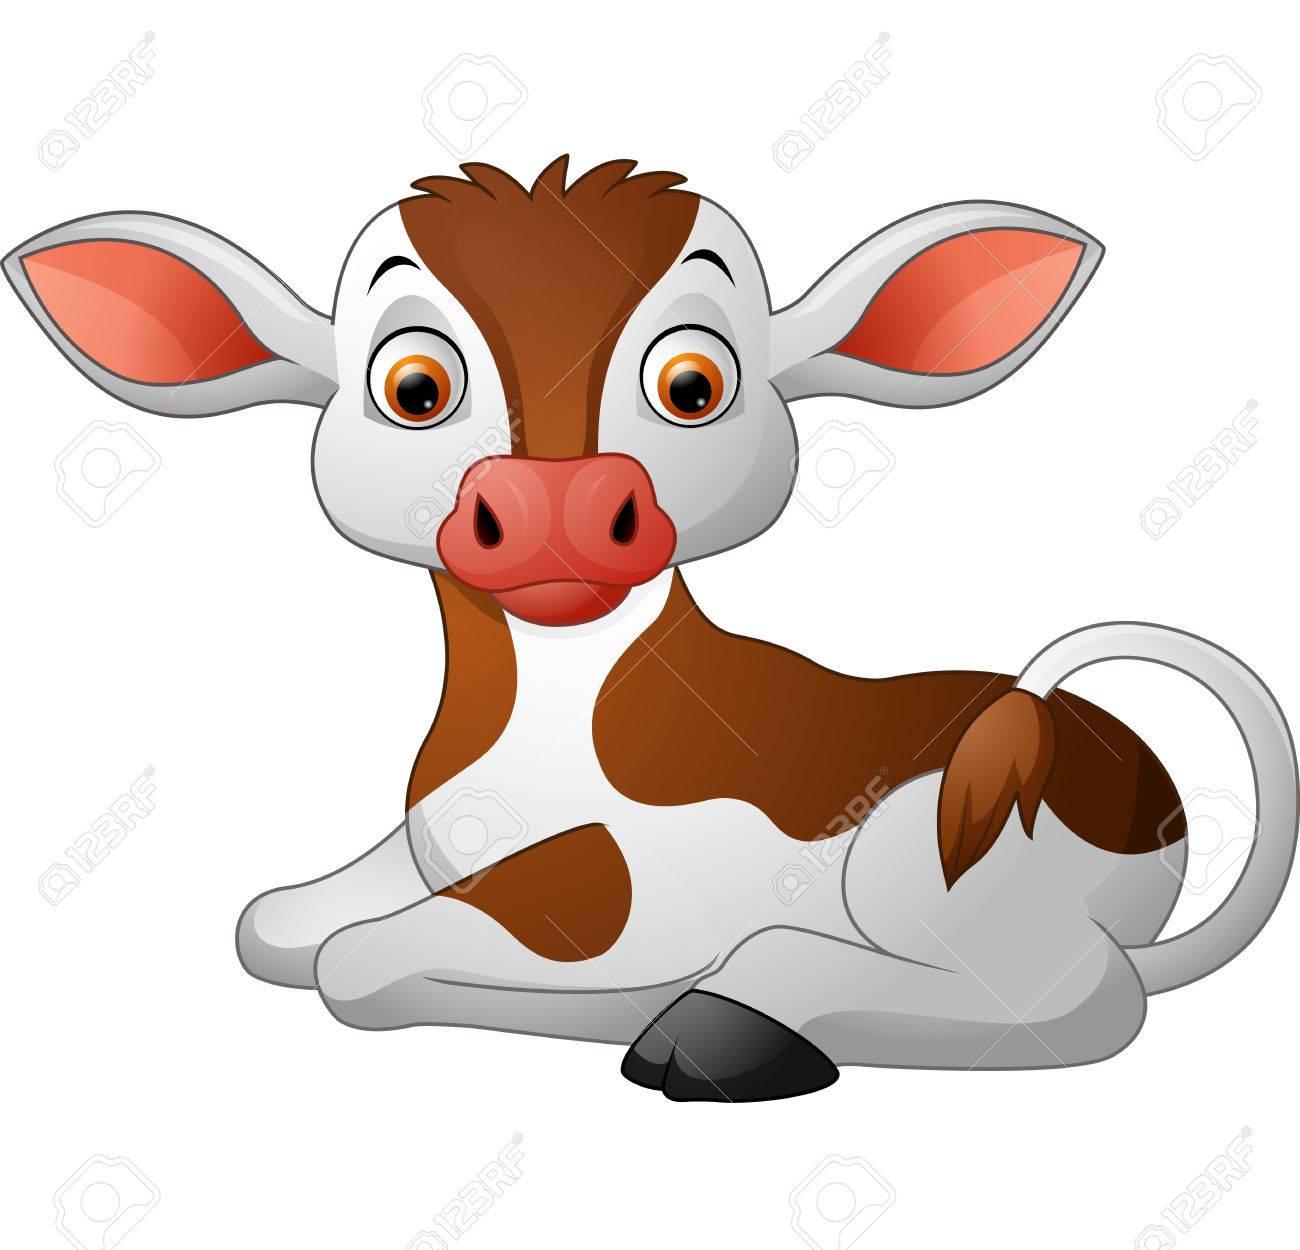 Cute baby cow sitting.